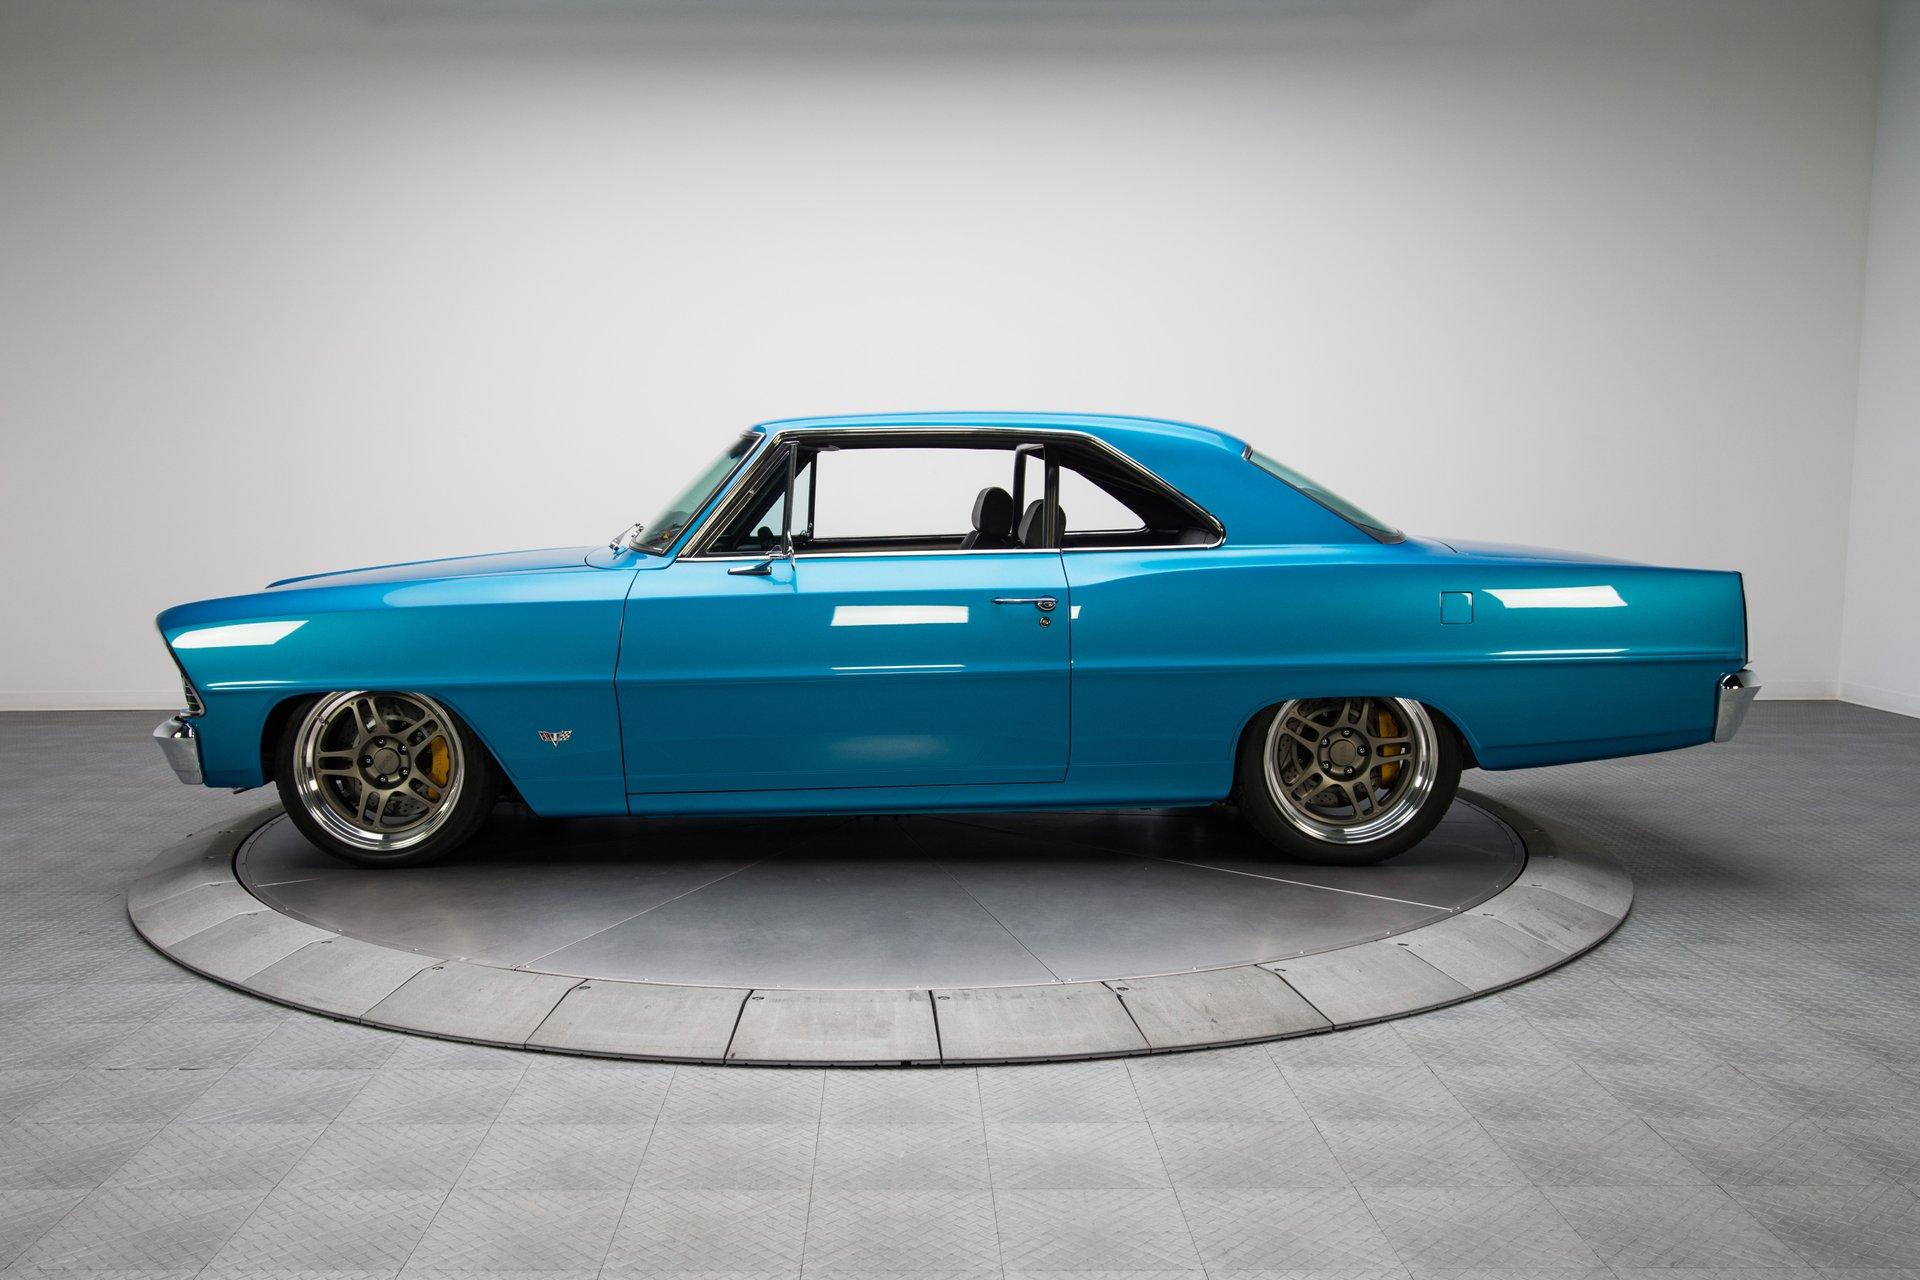 134497 1967 Chevrolet Nova RK Motors Classic Cars for Sale